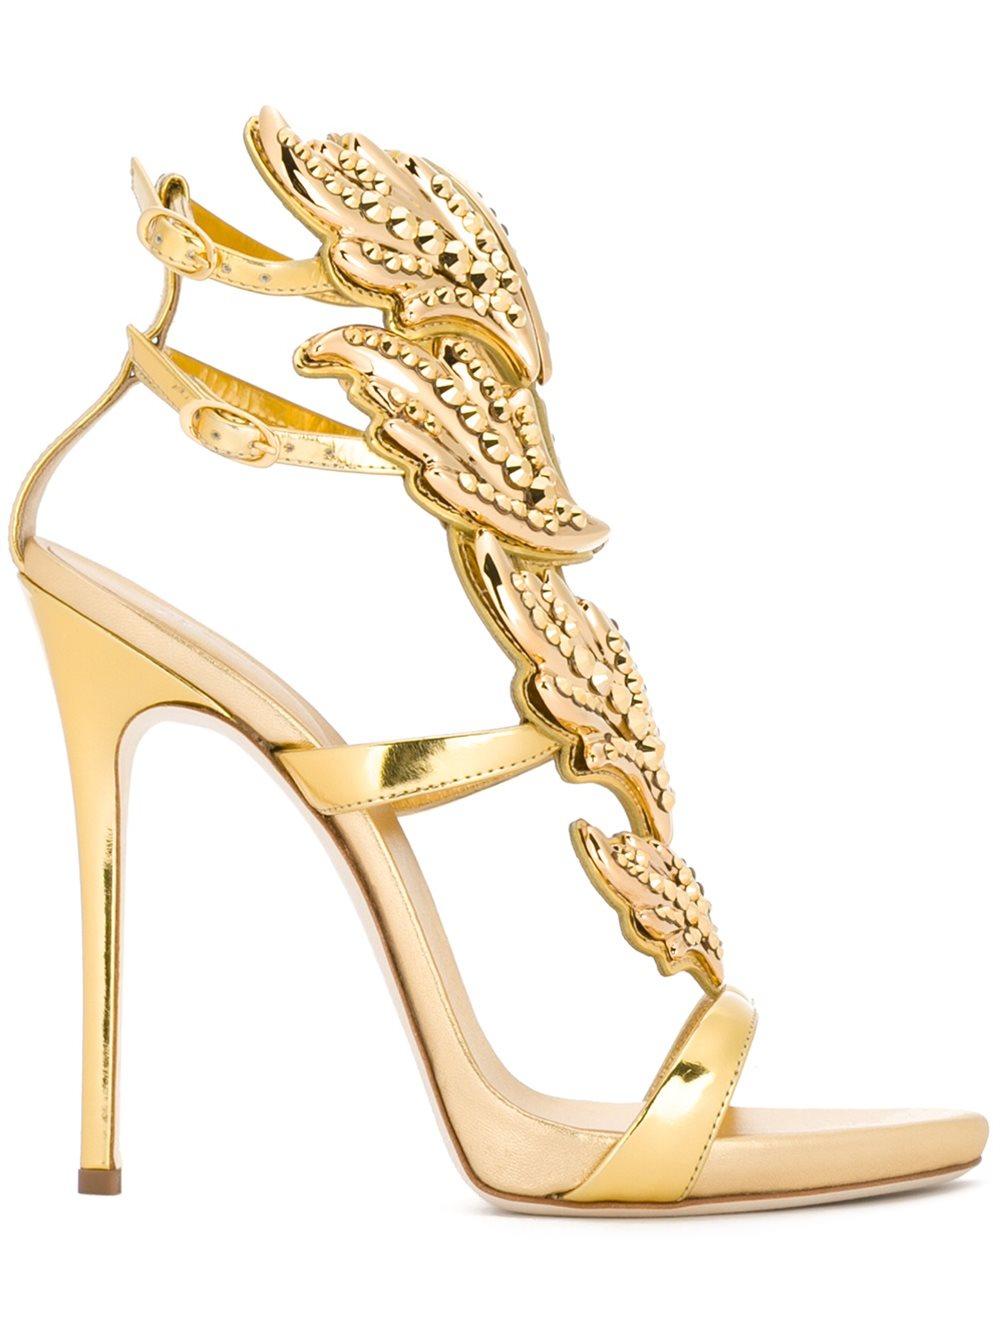 Lyst Giuseppe Zanotti Cruel Crystal Sandals Women